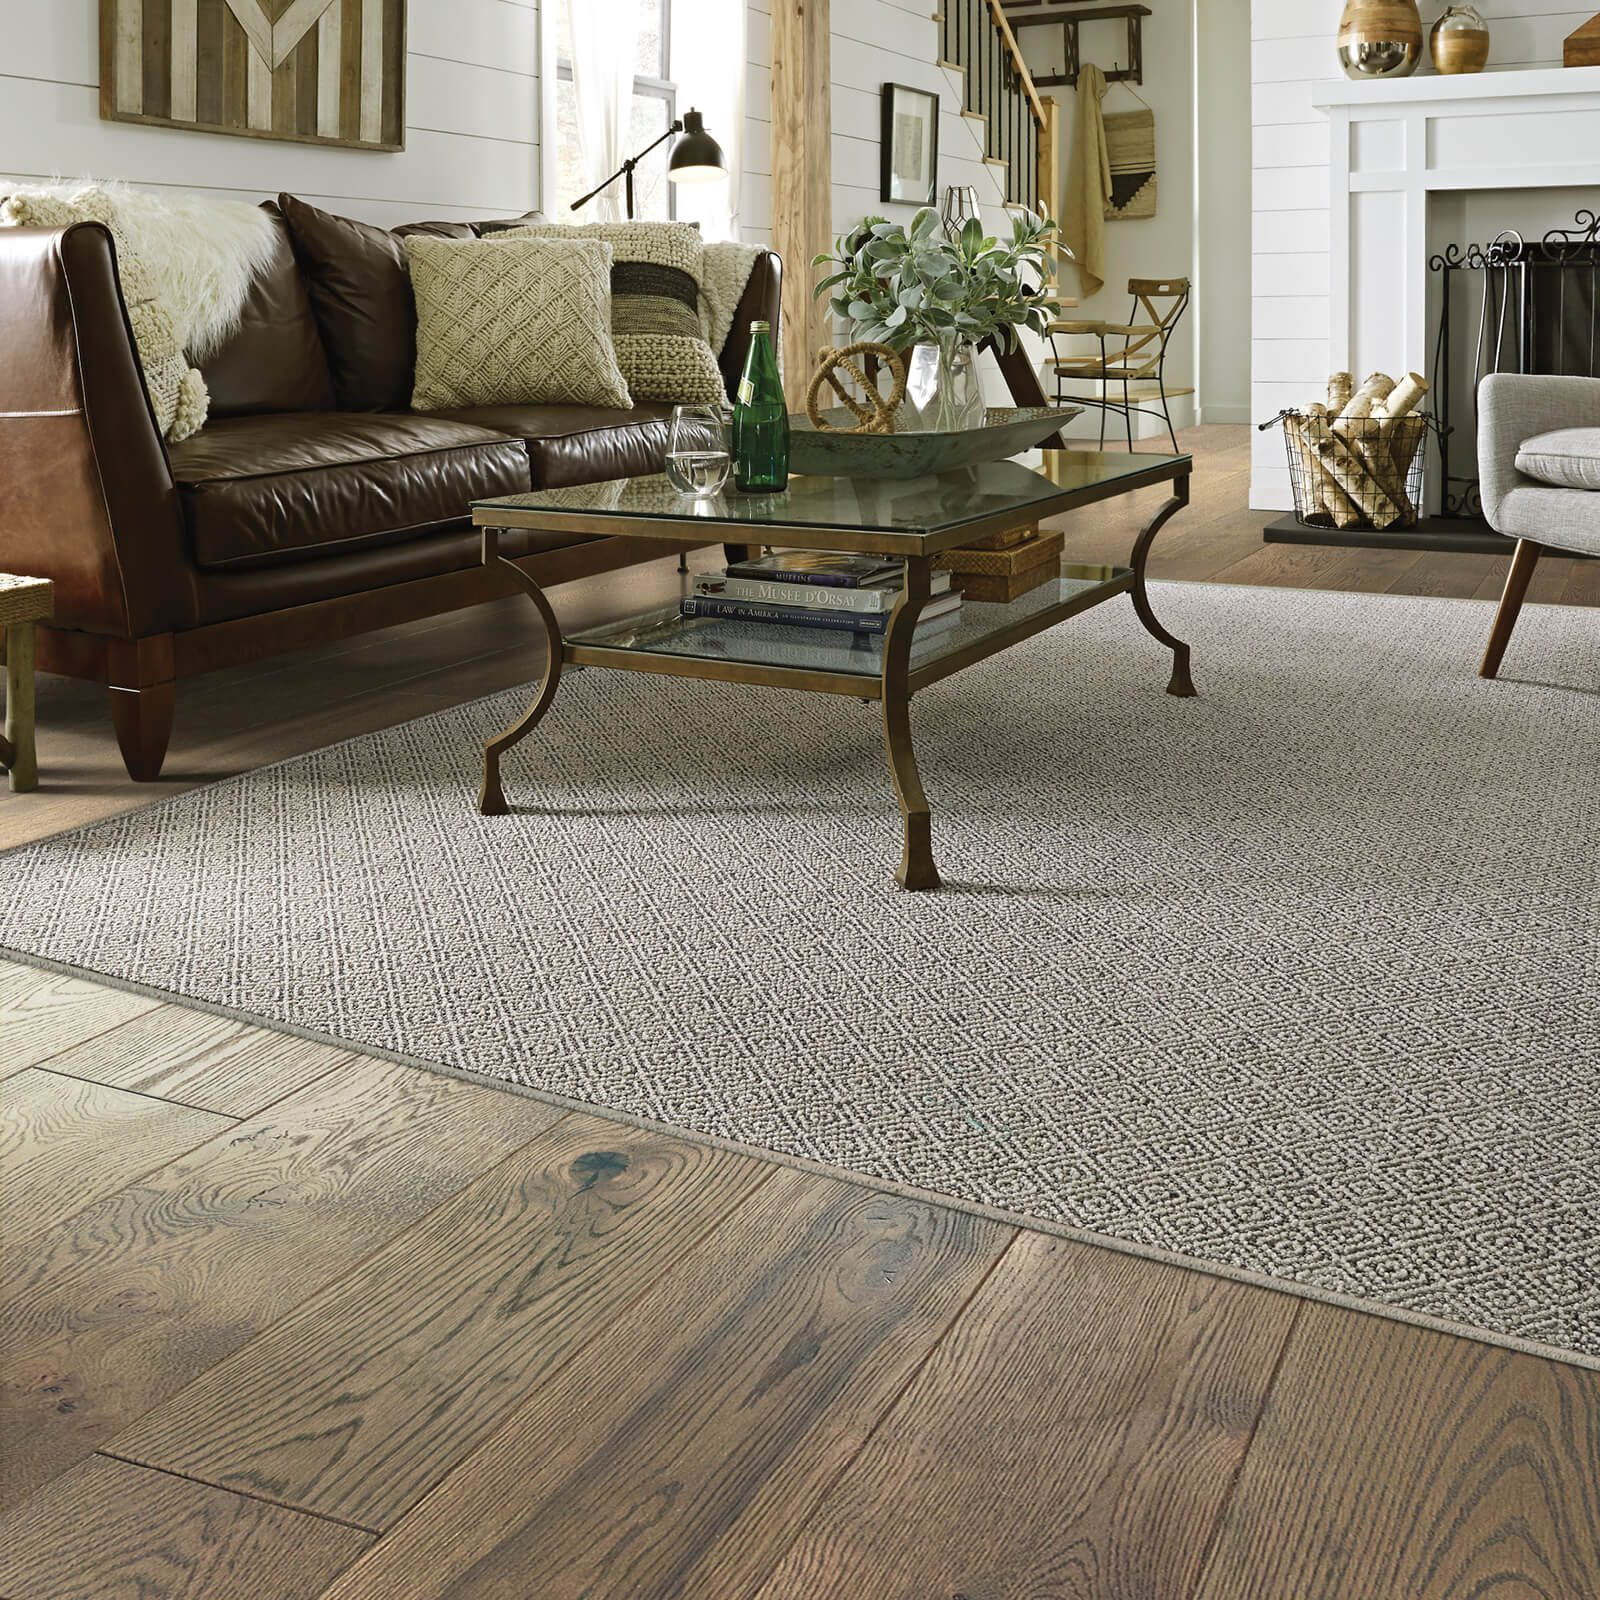 Buckingham flooring | Great Lakes Carpet & Tile